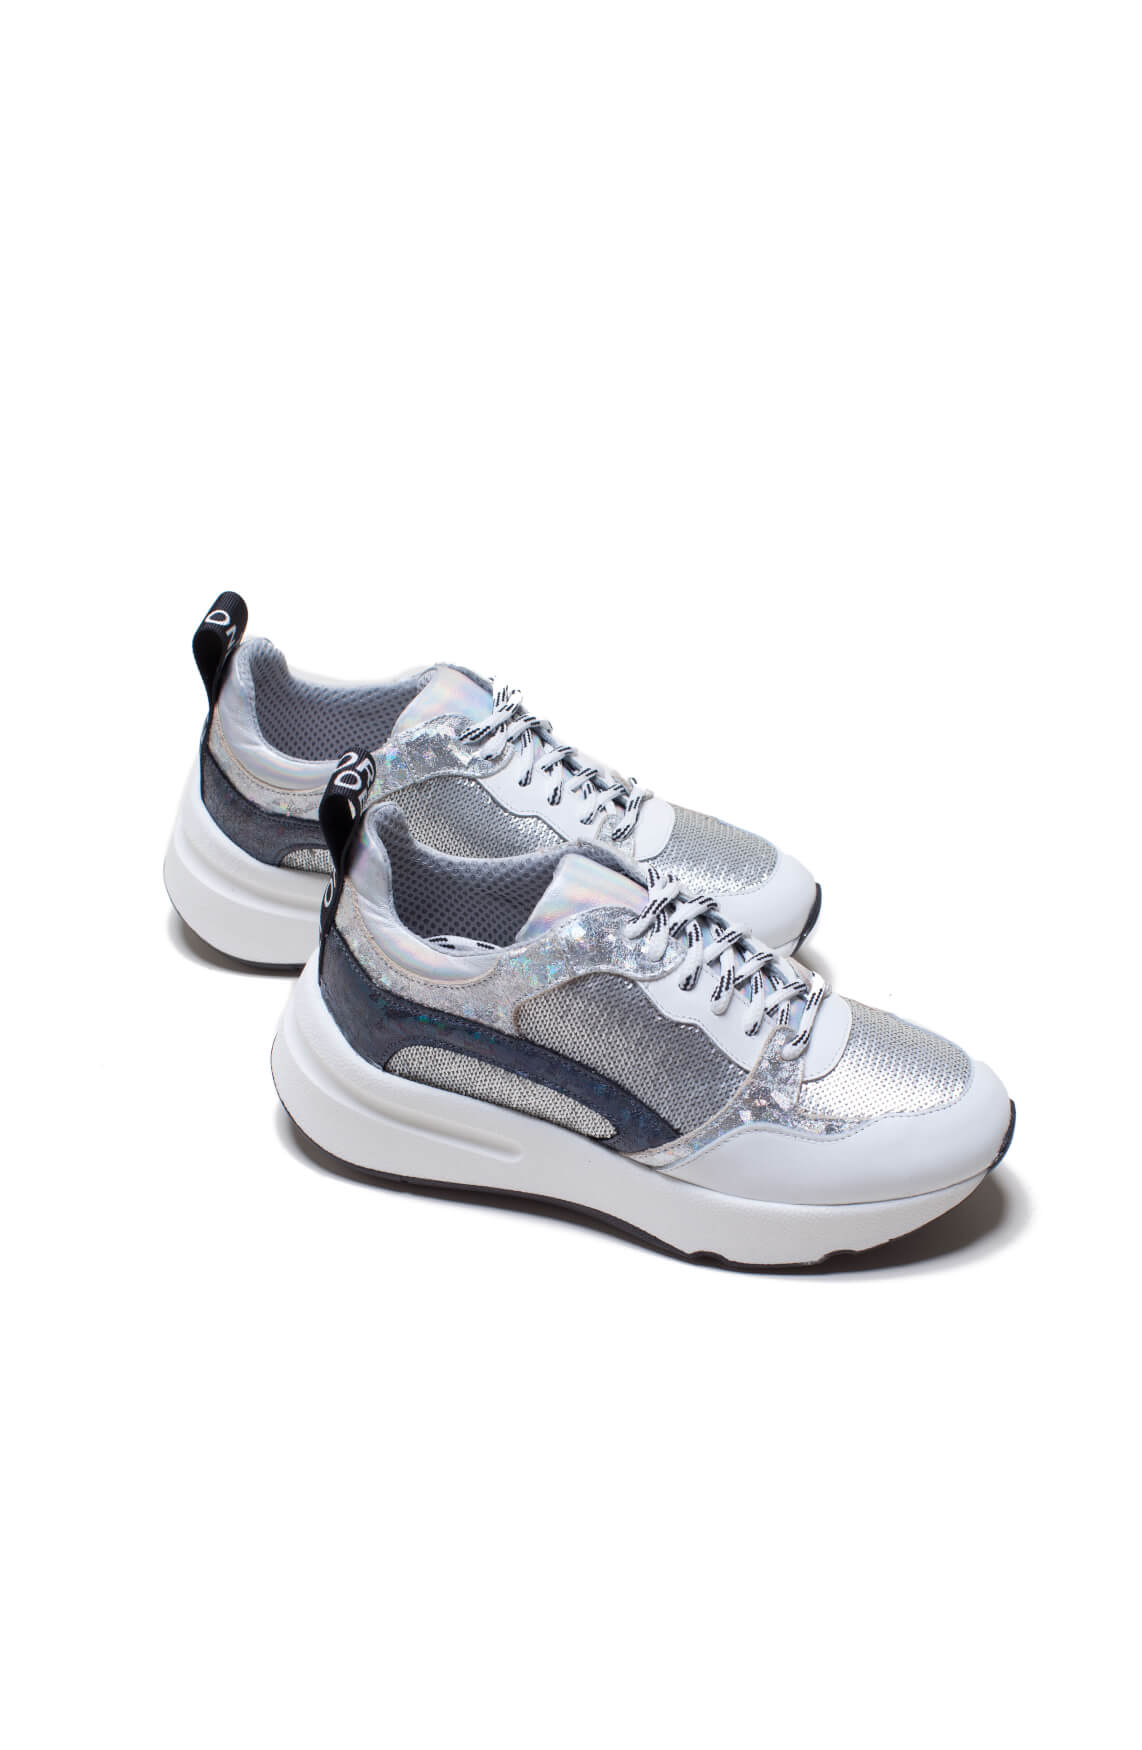 Meline Dames Metallic sneaker met pailletten wit